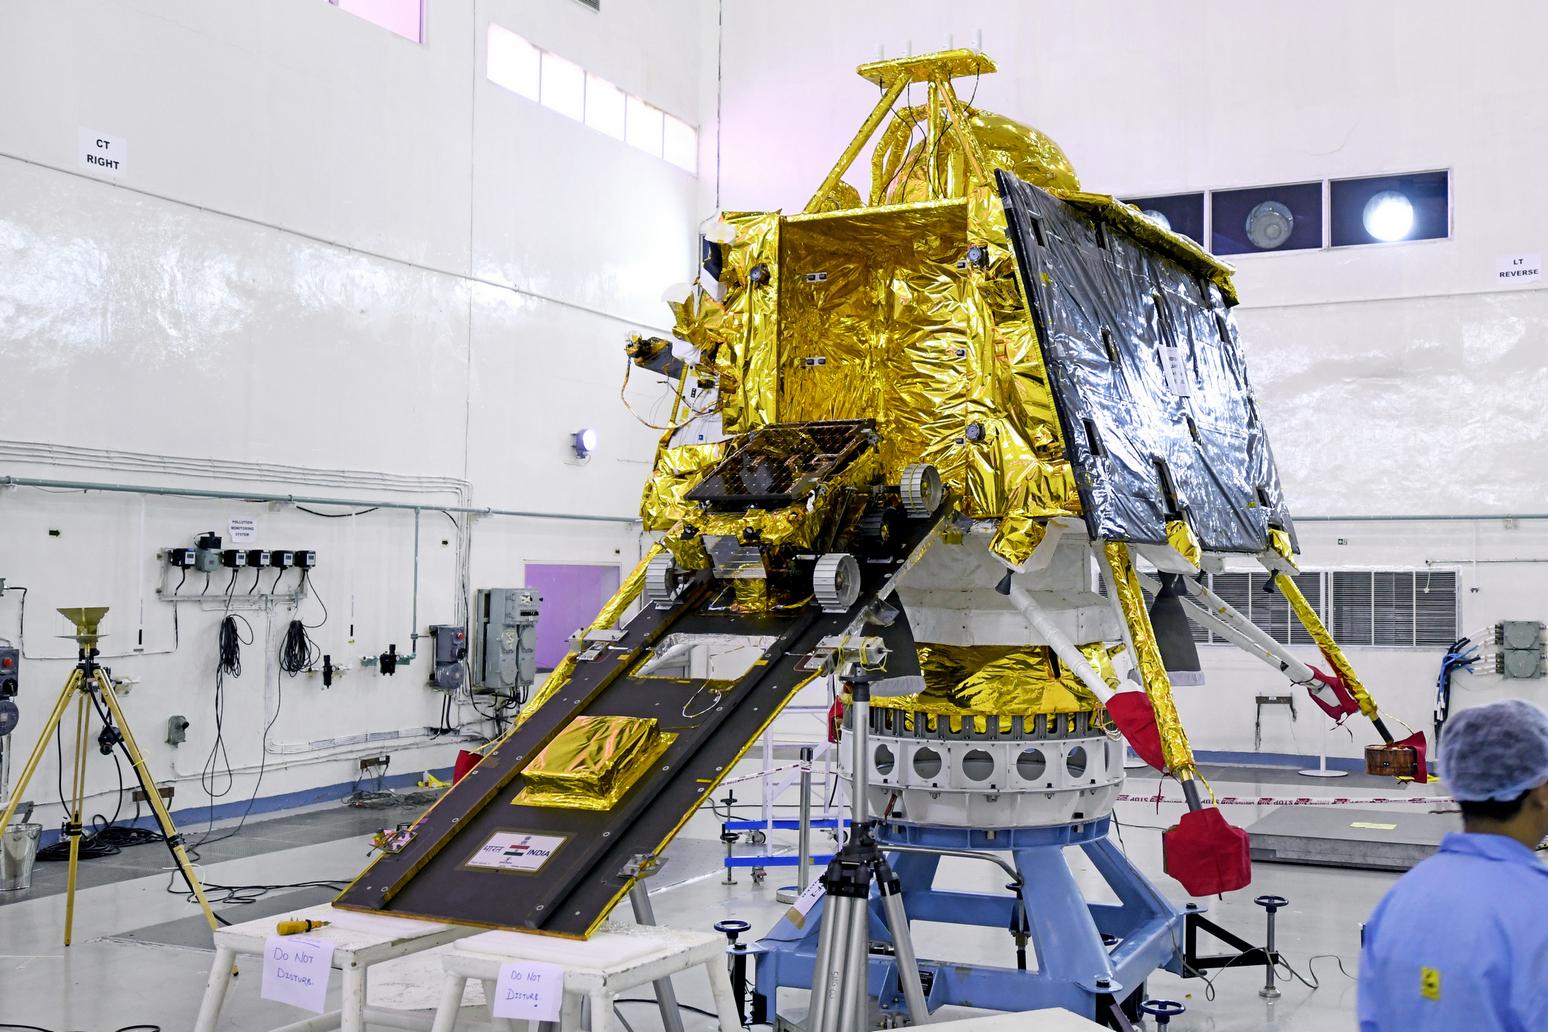 Посадочный модуль «Викрам» с луноходом на опускаемом трапе. Фото Indian Space Research Organisation (isro.gov.in)